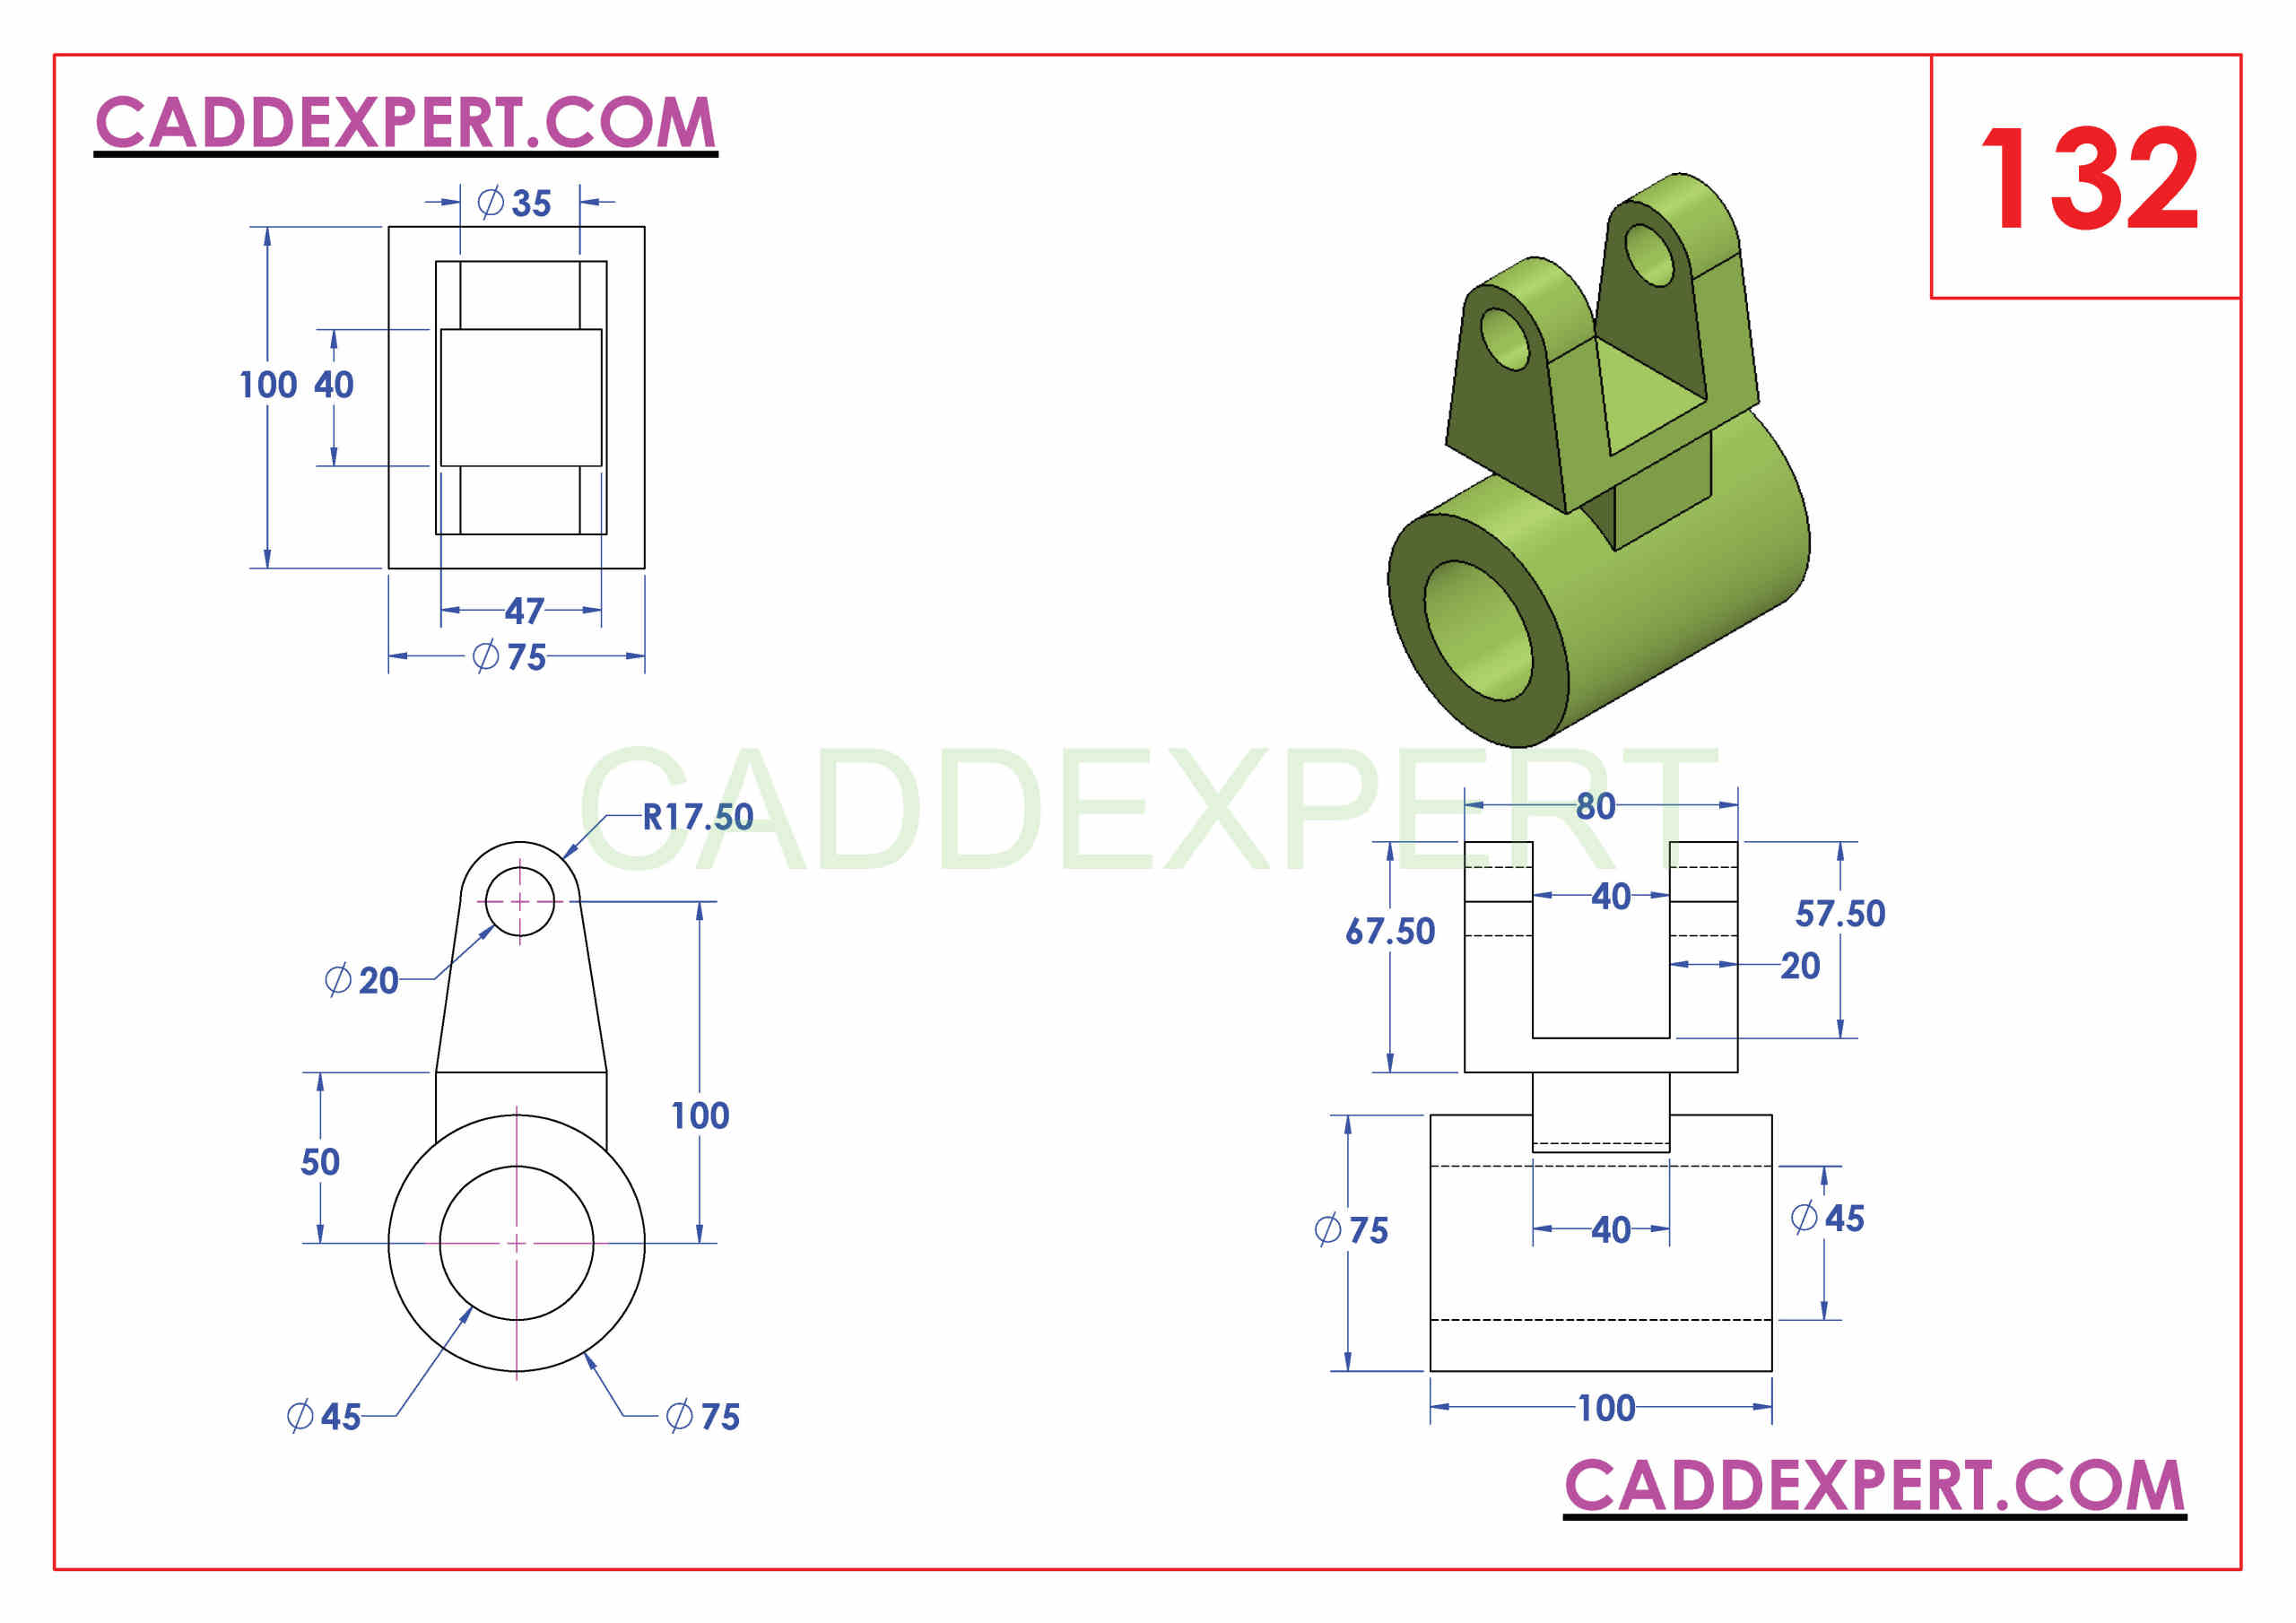 SOLIDWORKS CATIA NX AUTOCAD 3D DRAWINGS PRACTICE BOOKS 100 PDF -132